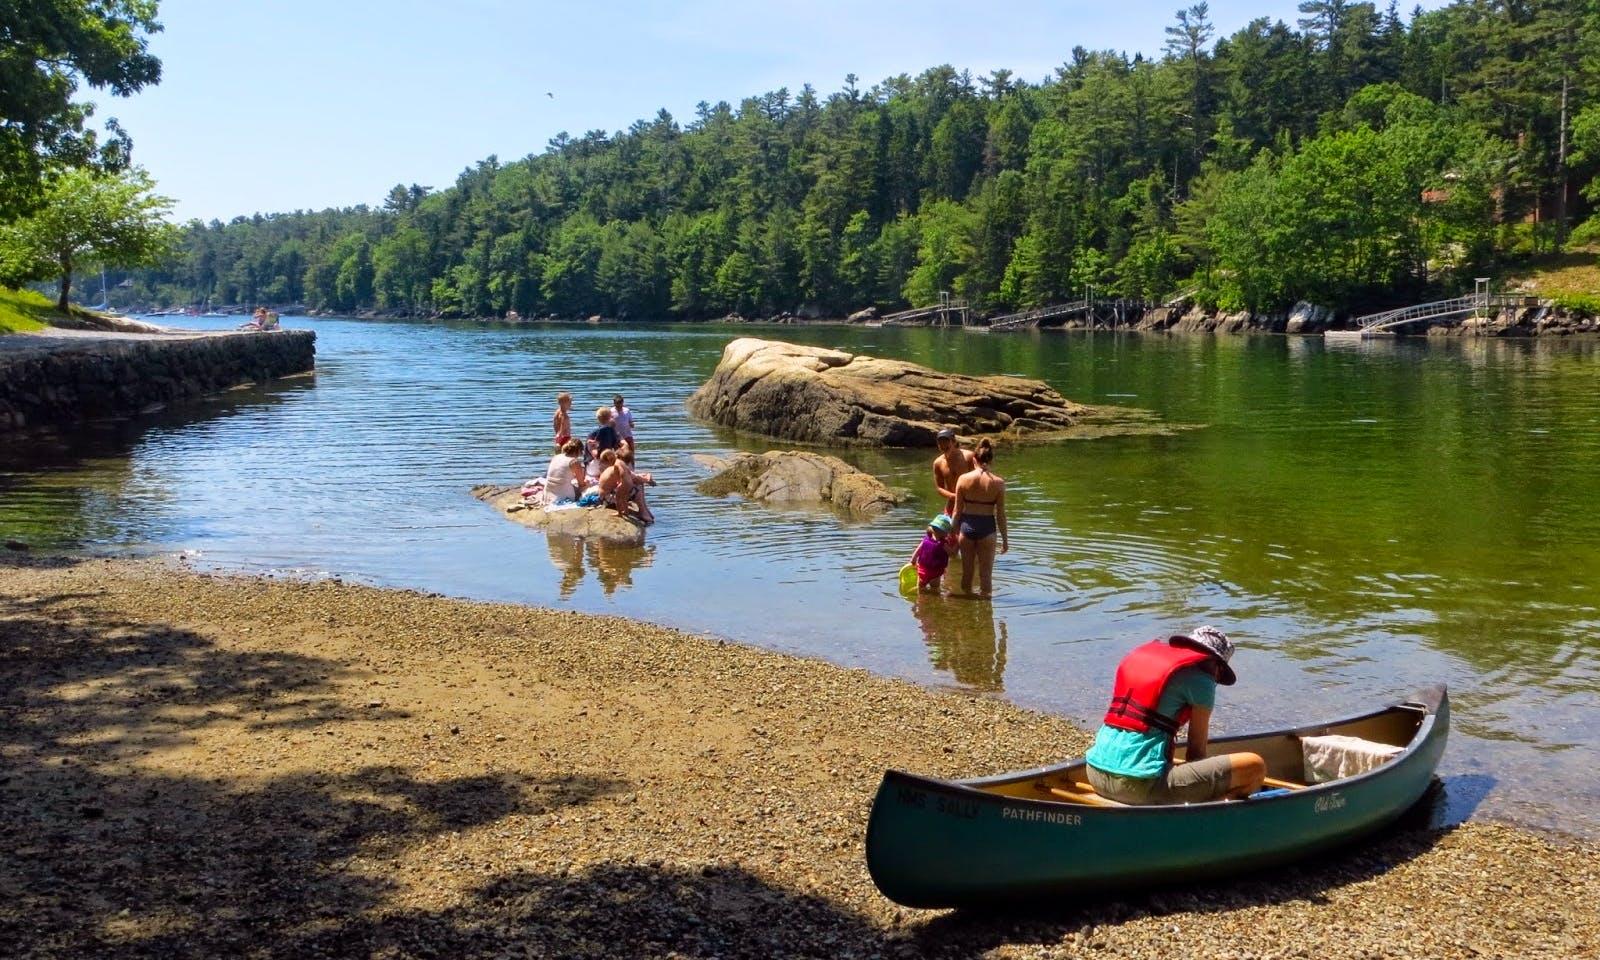 Canoe Rental in Damariscotta, Maine